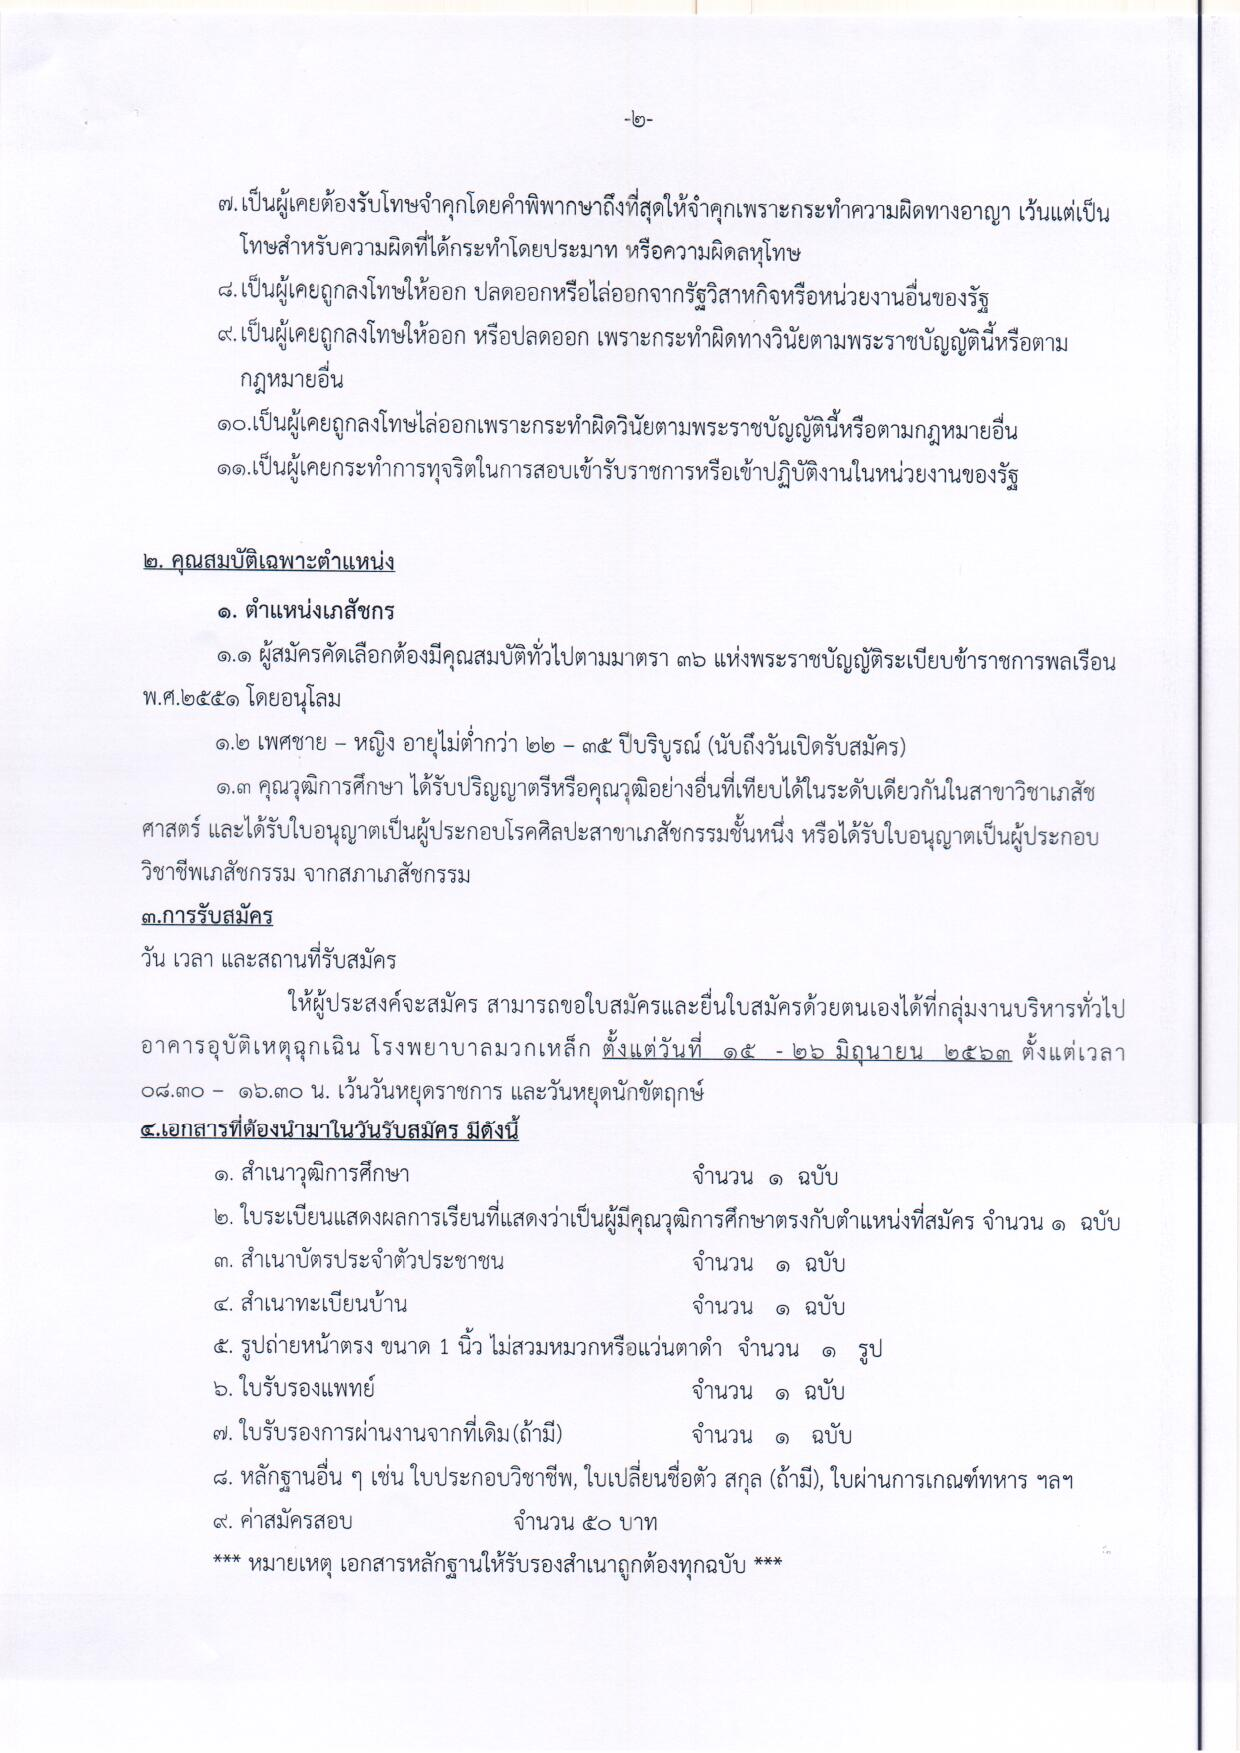 job630612_2